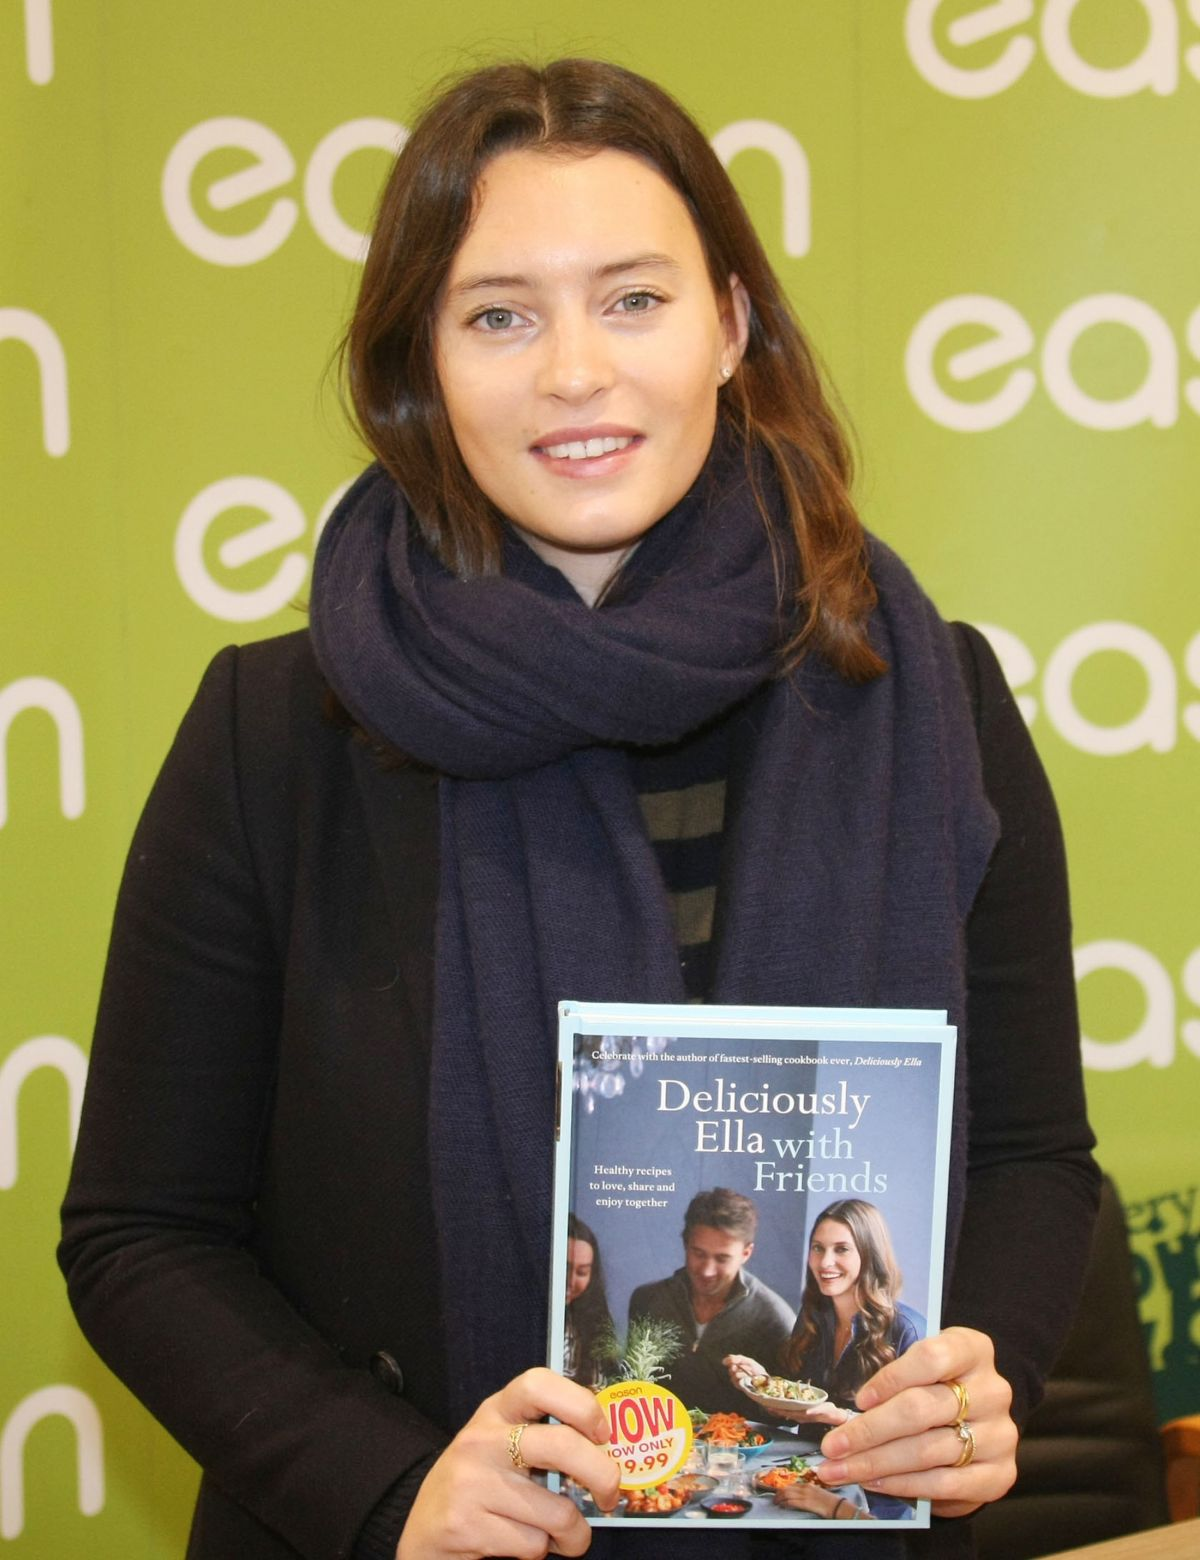 ELLA WOODWARD Promoting Her